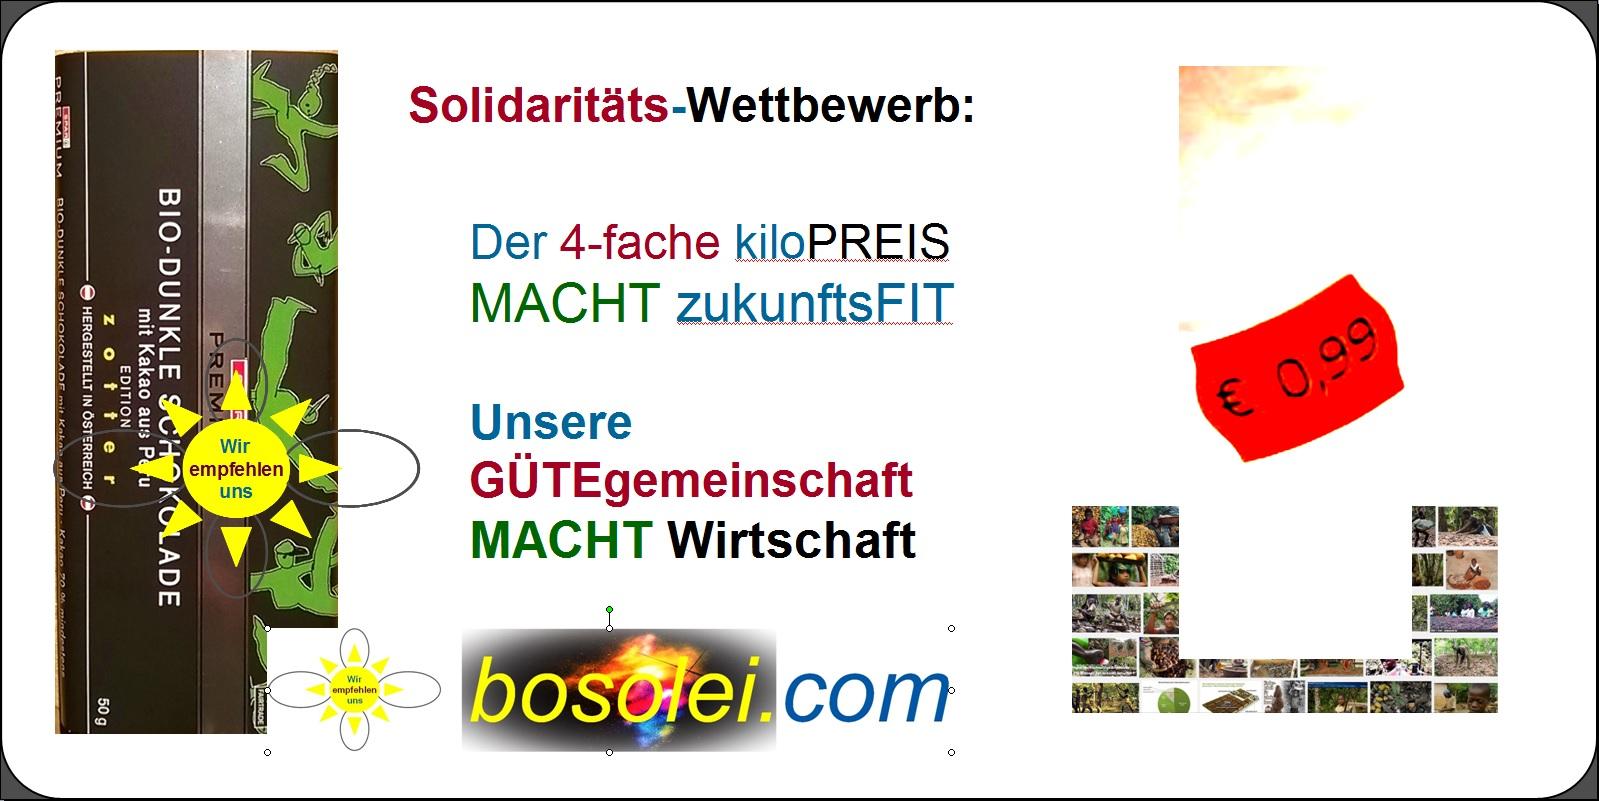 UNSER-Solidaritaetswettbewerb